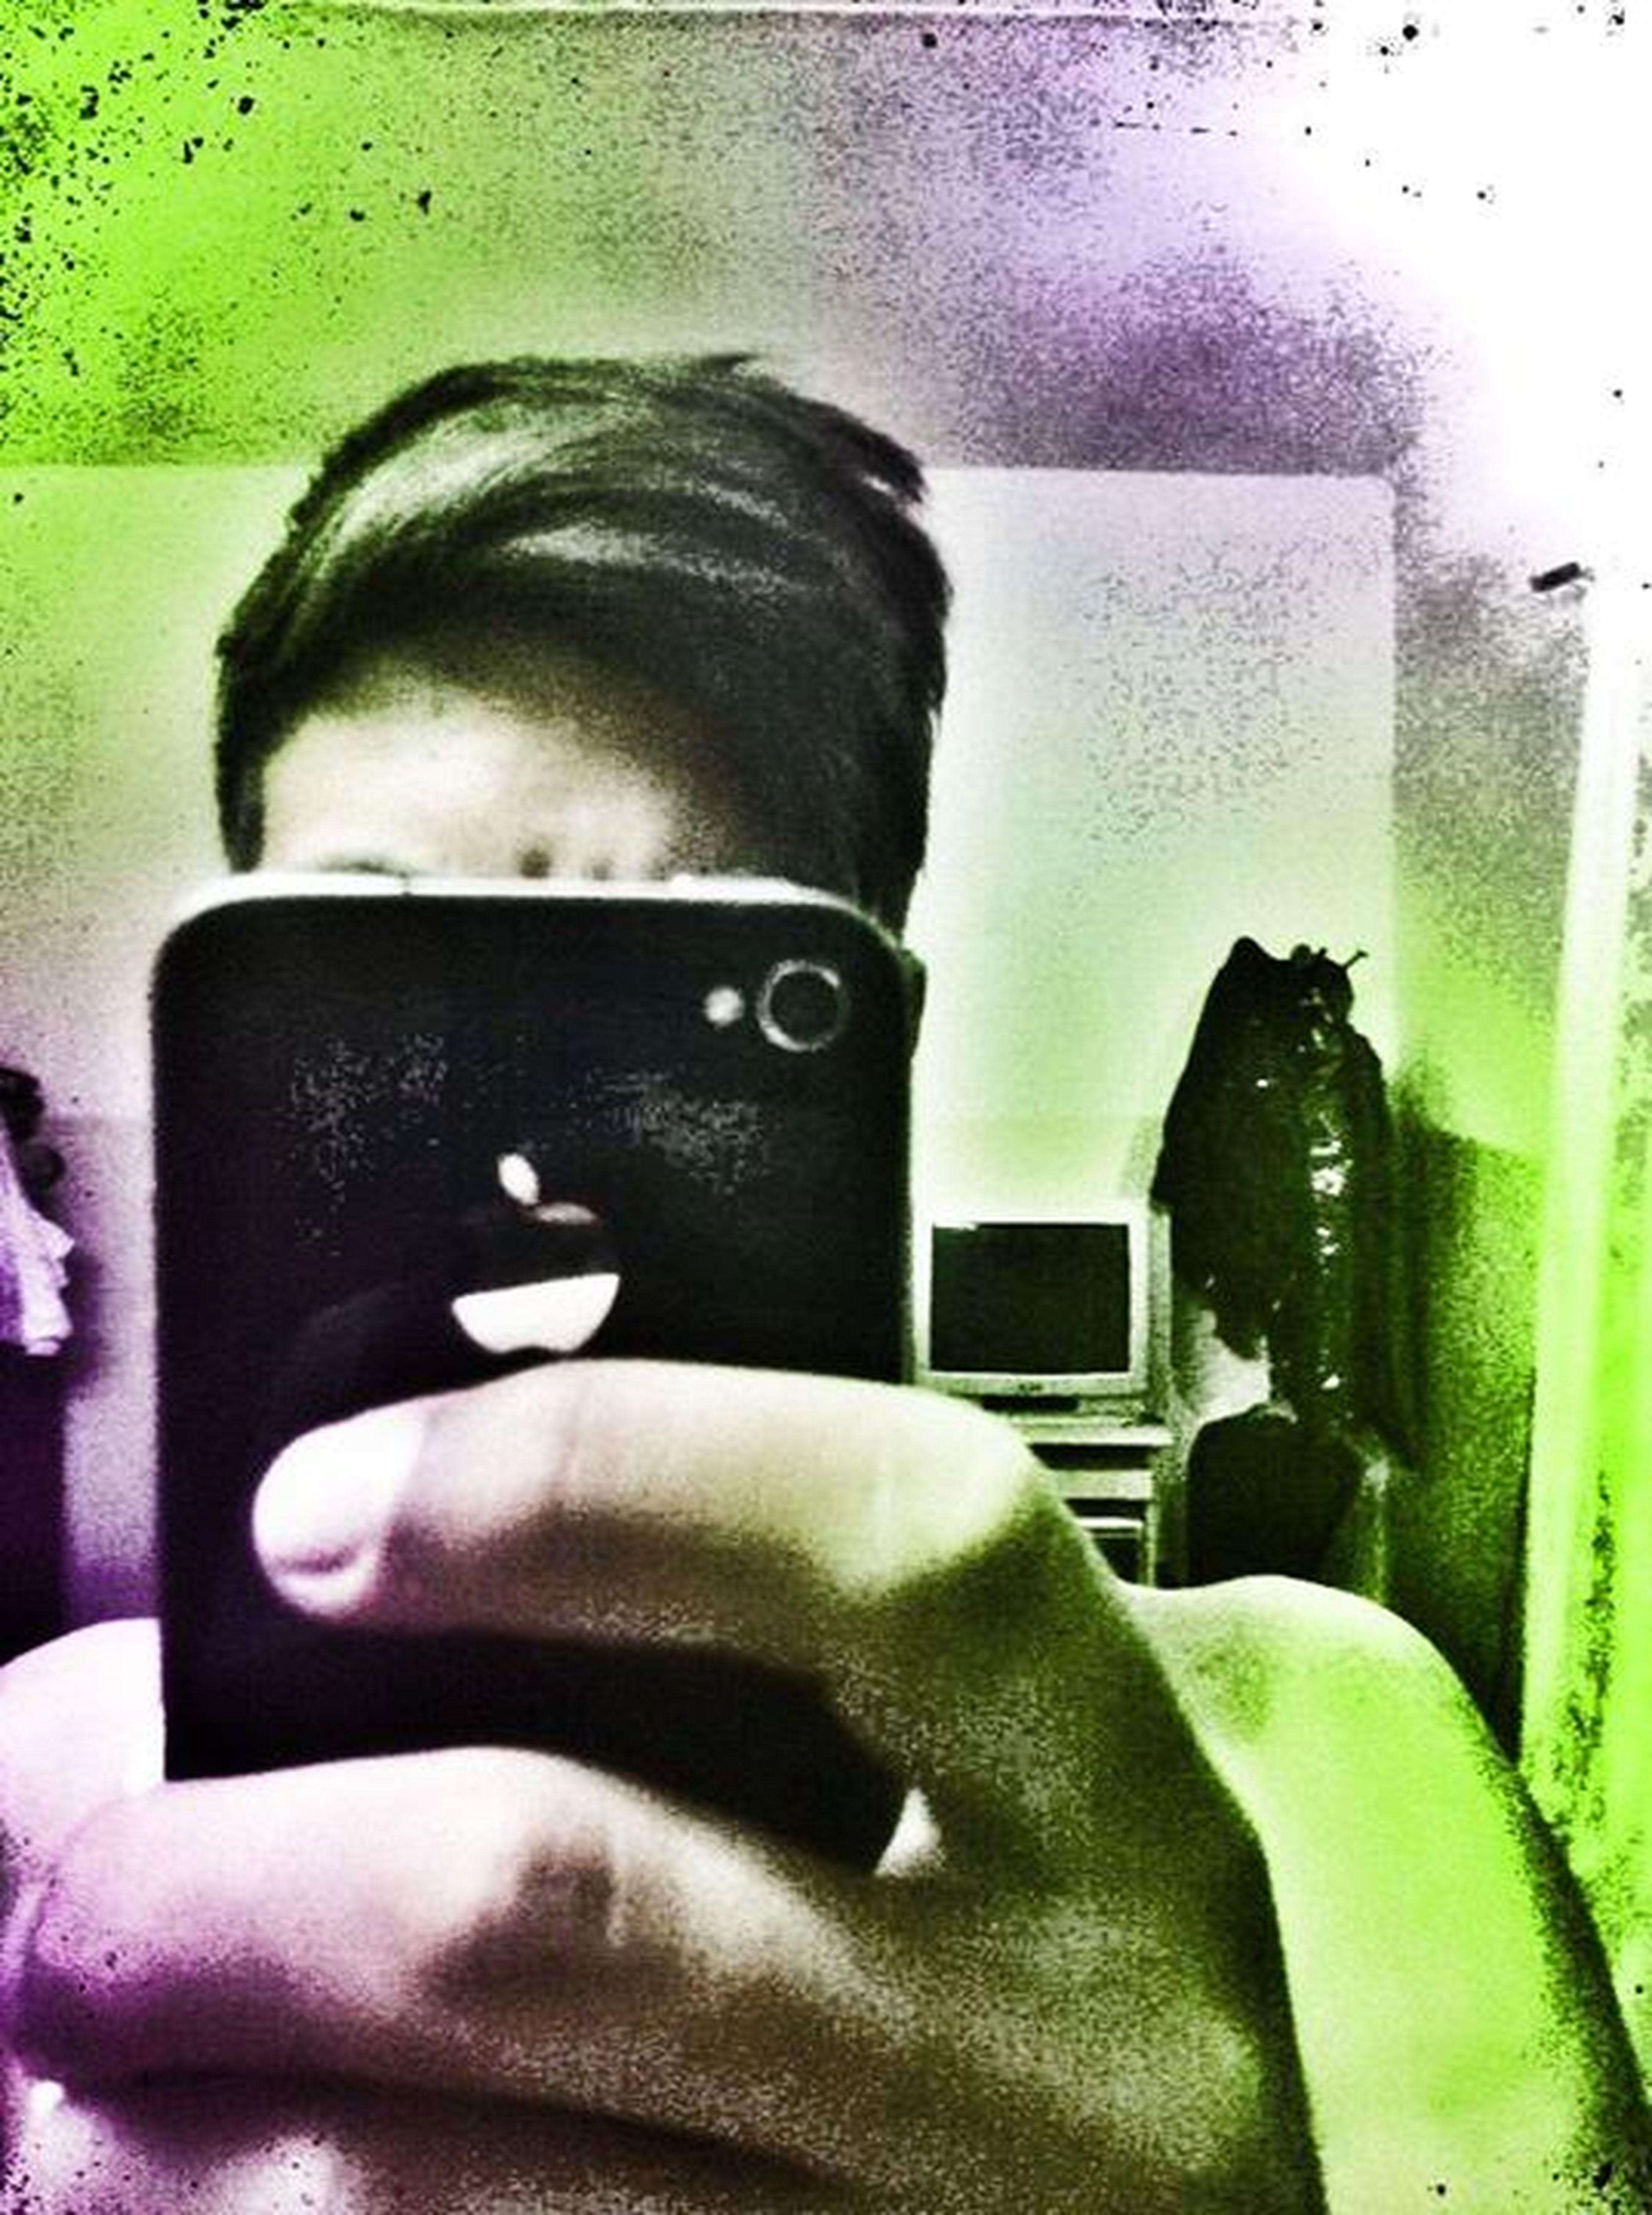 Iphone4 When I'm Alone Mirror Pic Love